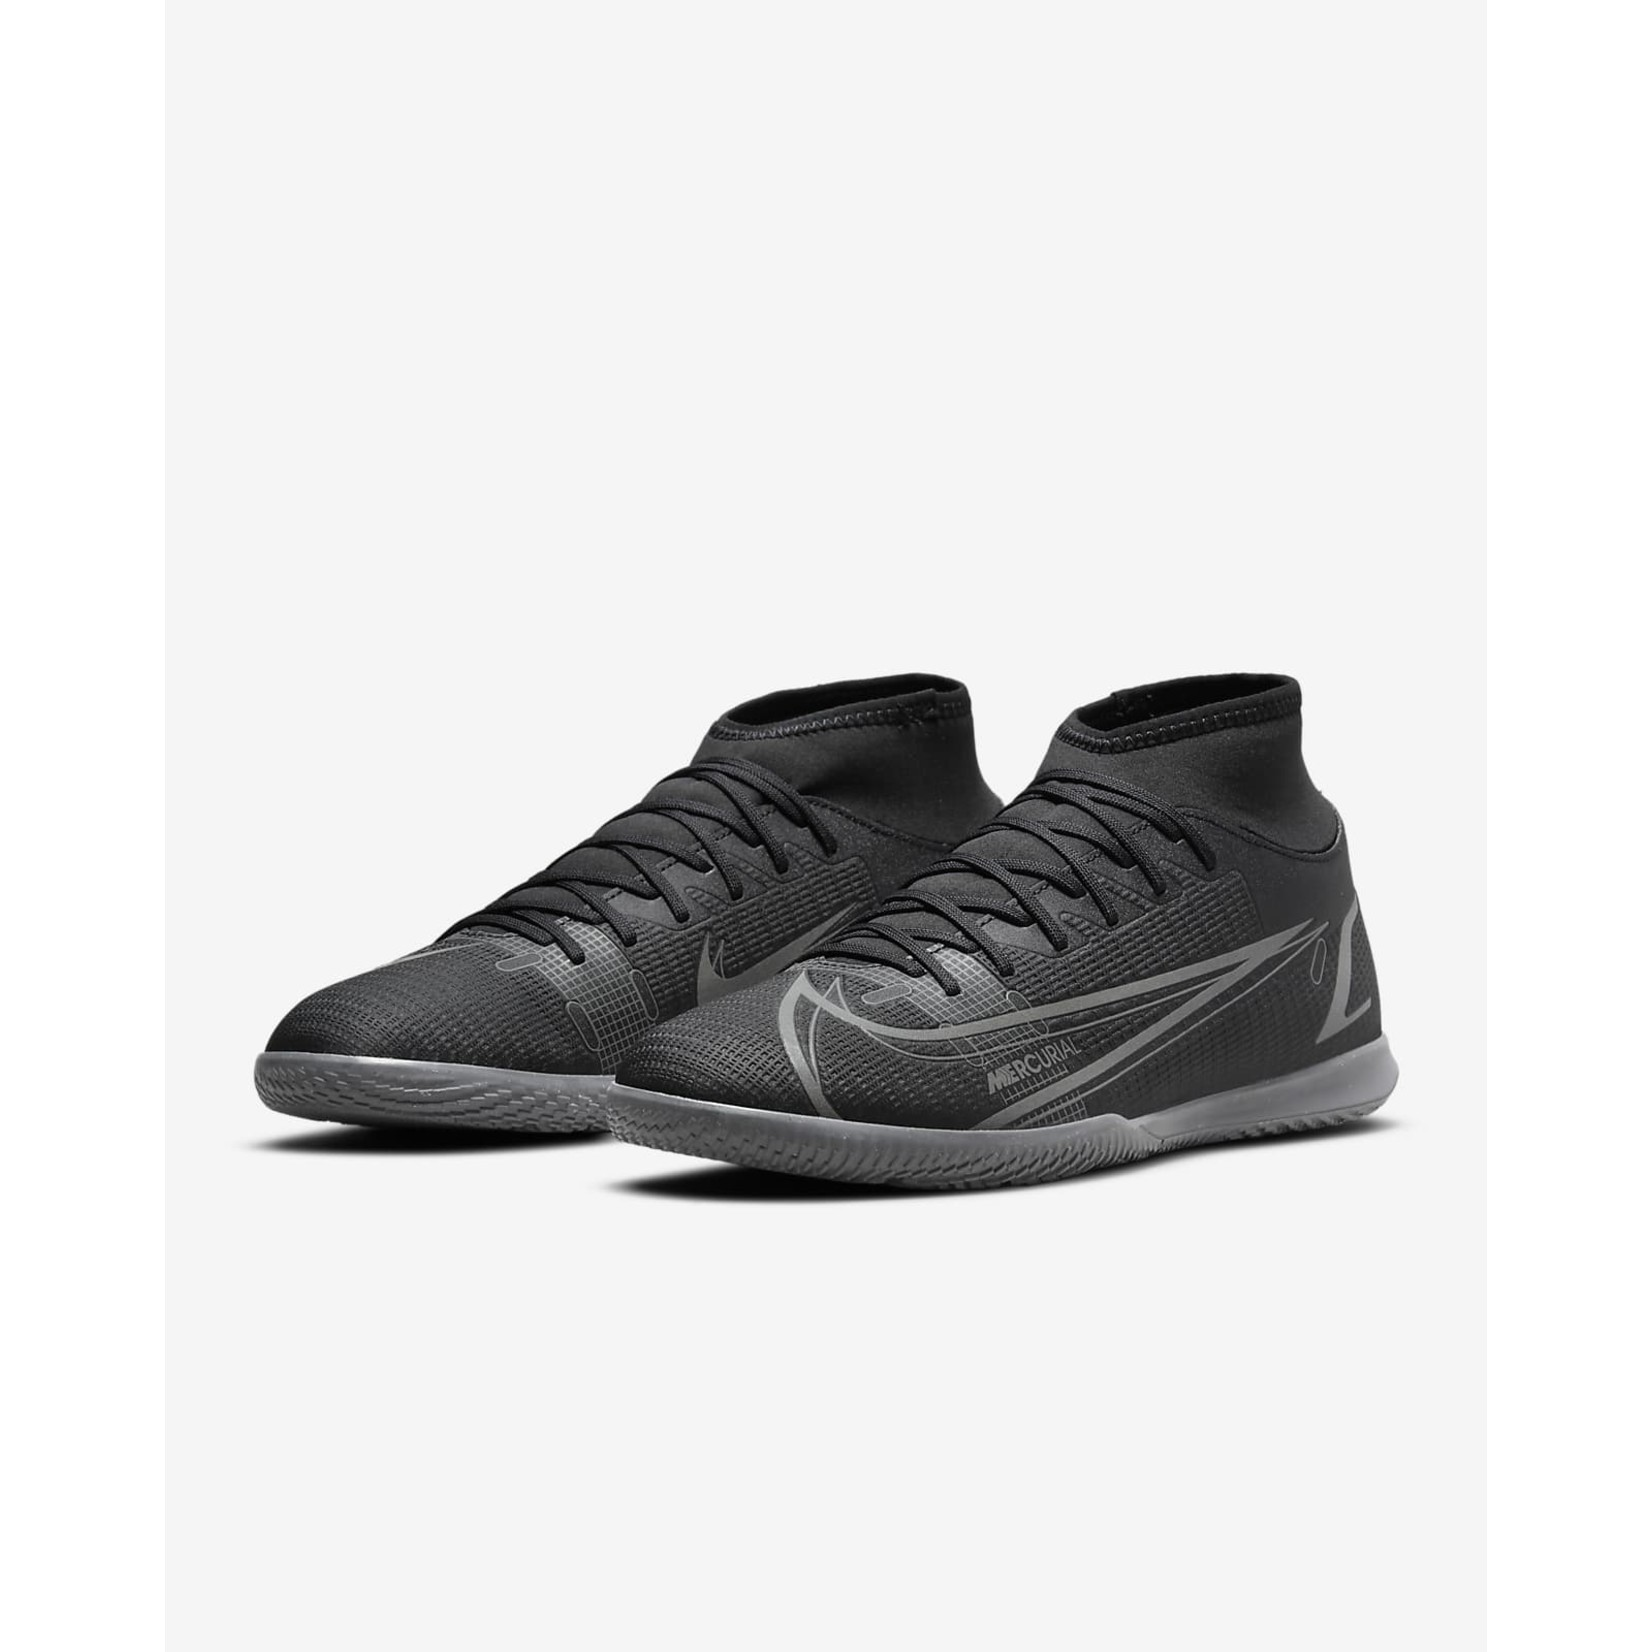 Nike Nike Indoor Soccer Shoes, Mercurial Superfly 8 Club, Mens